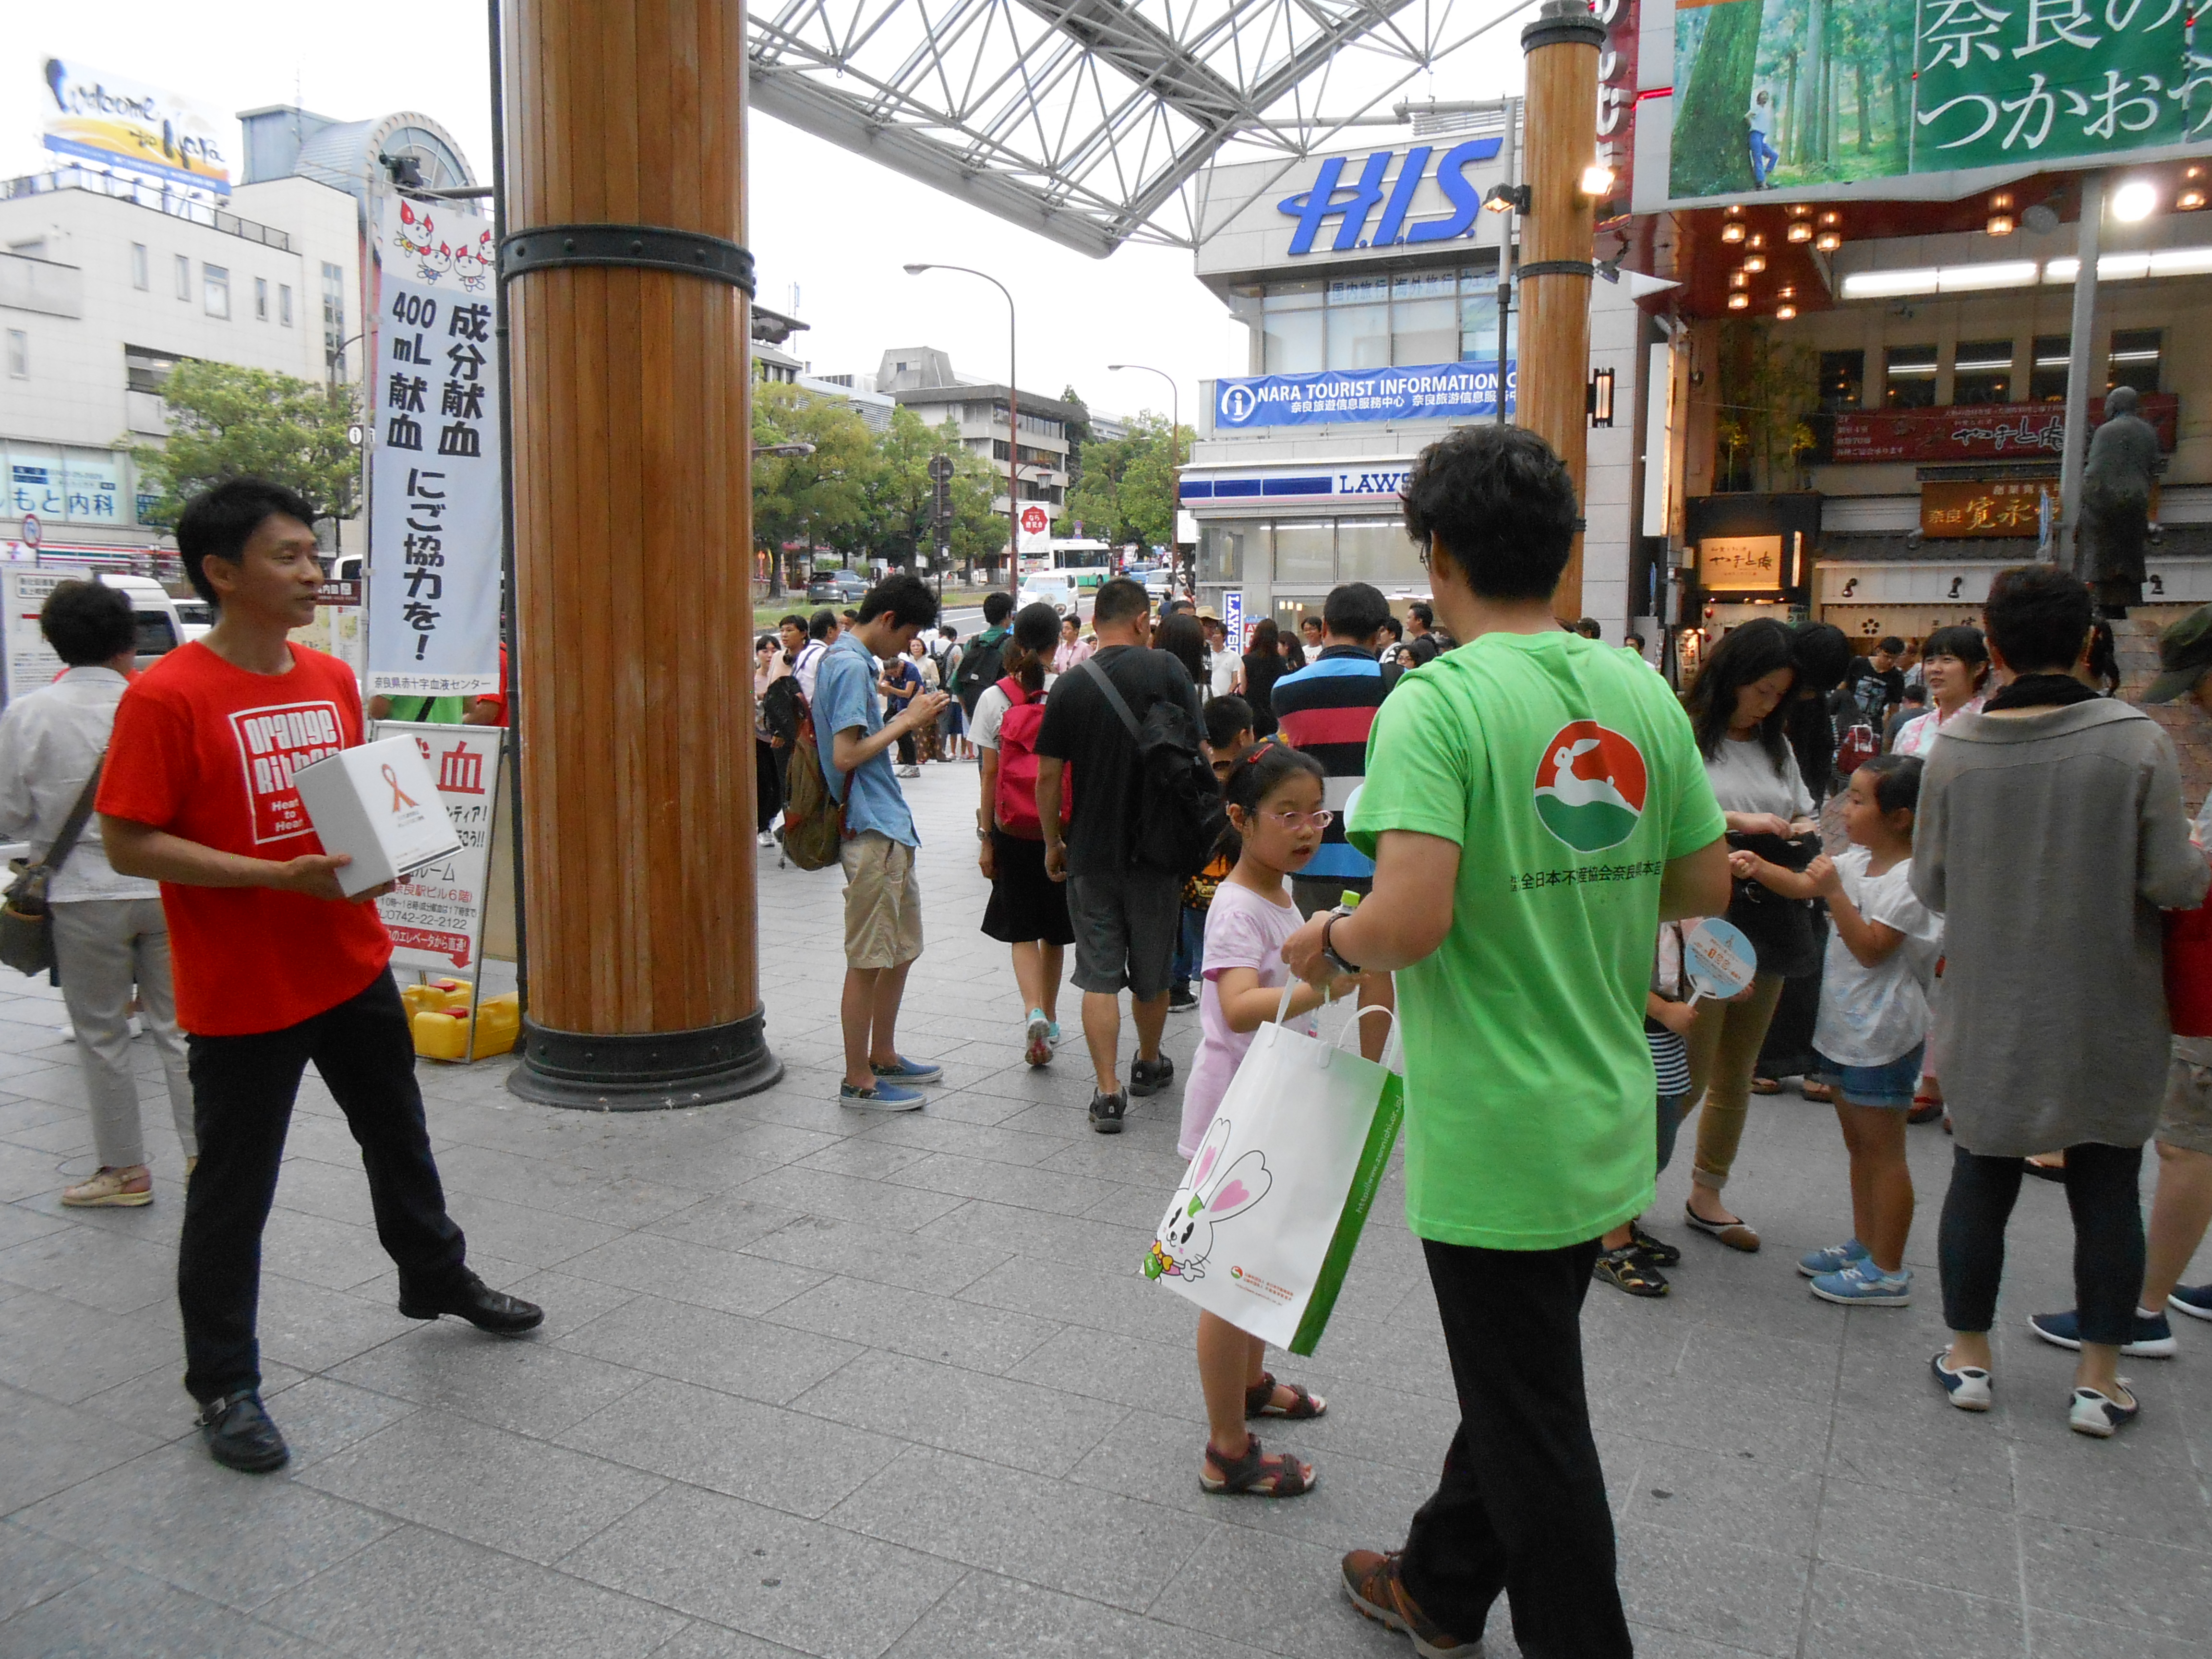 http://www.orangeribbon.jp/info/organization/images/DSCN0585.JPG